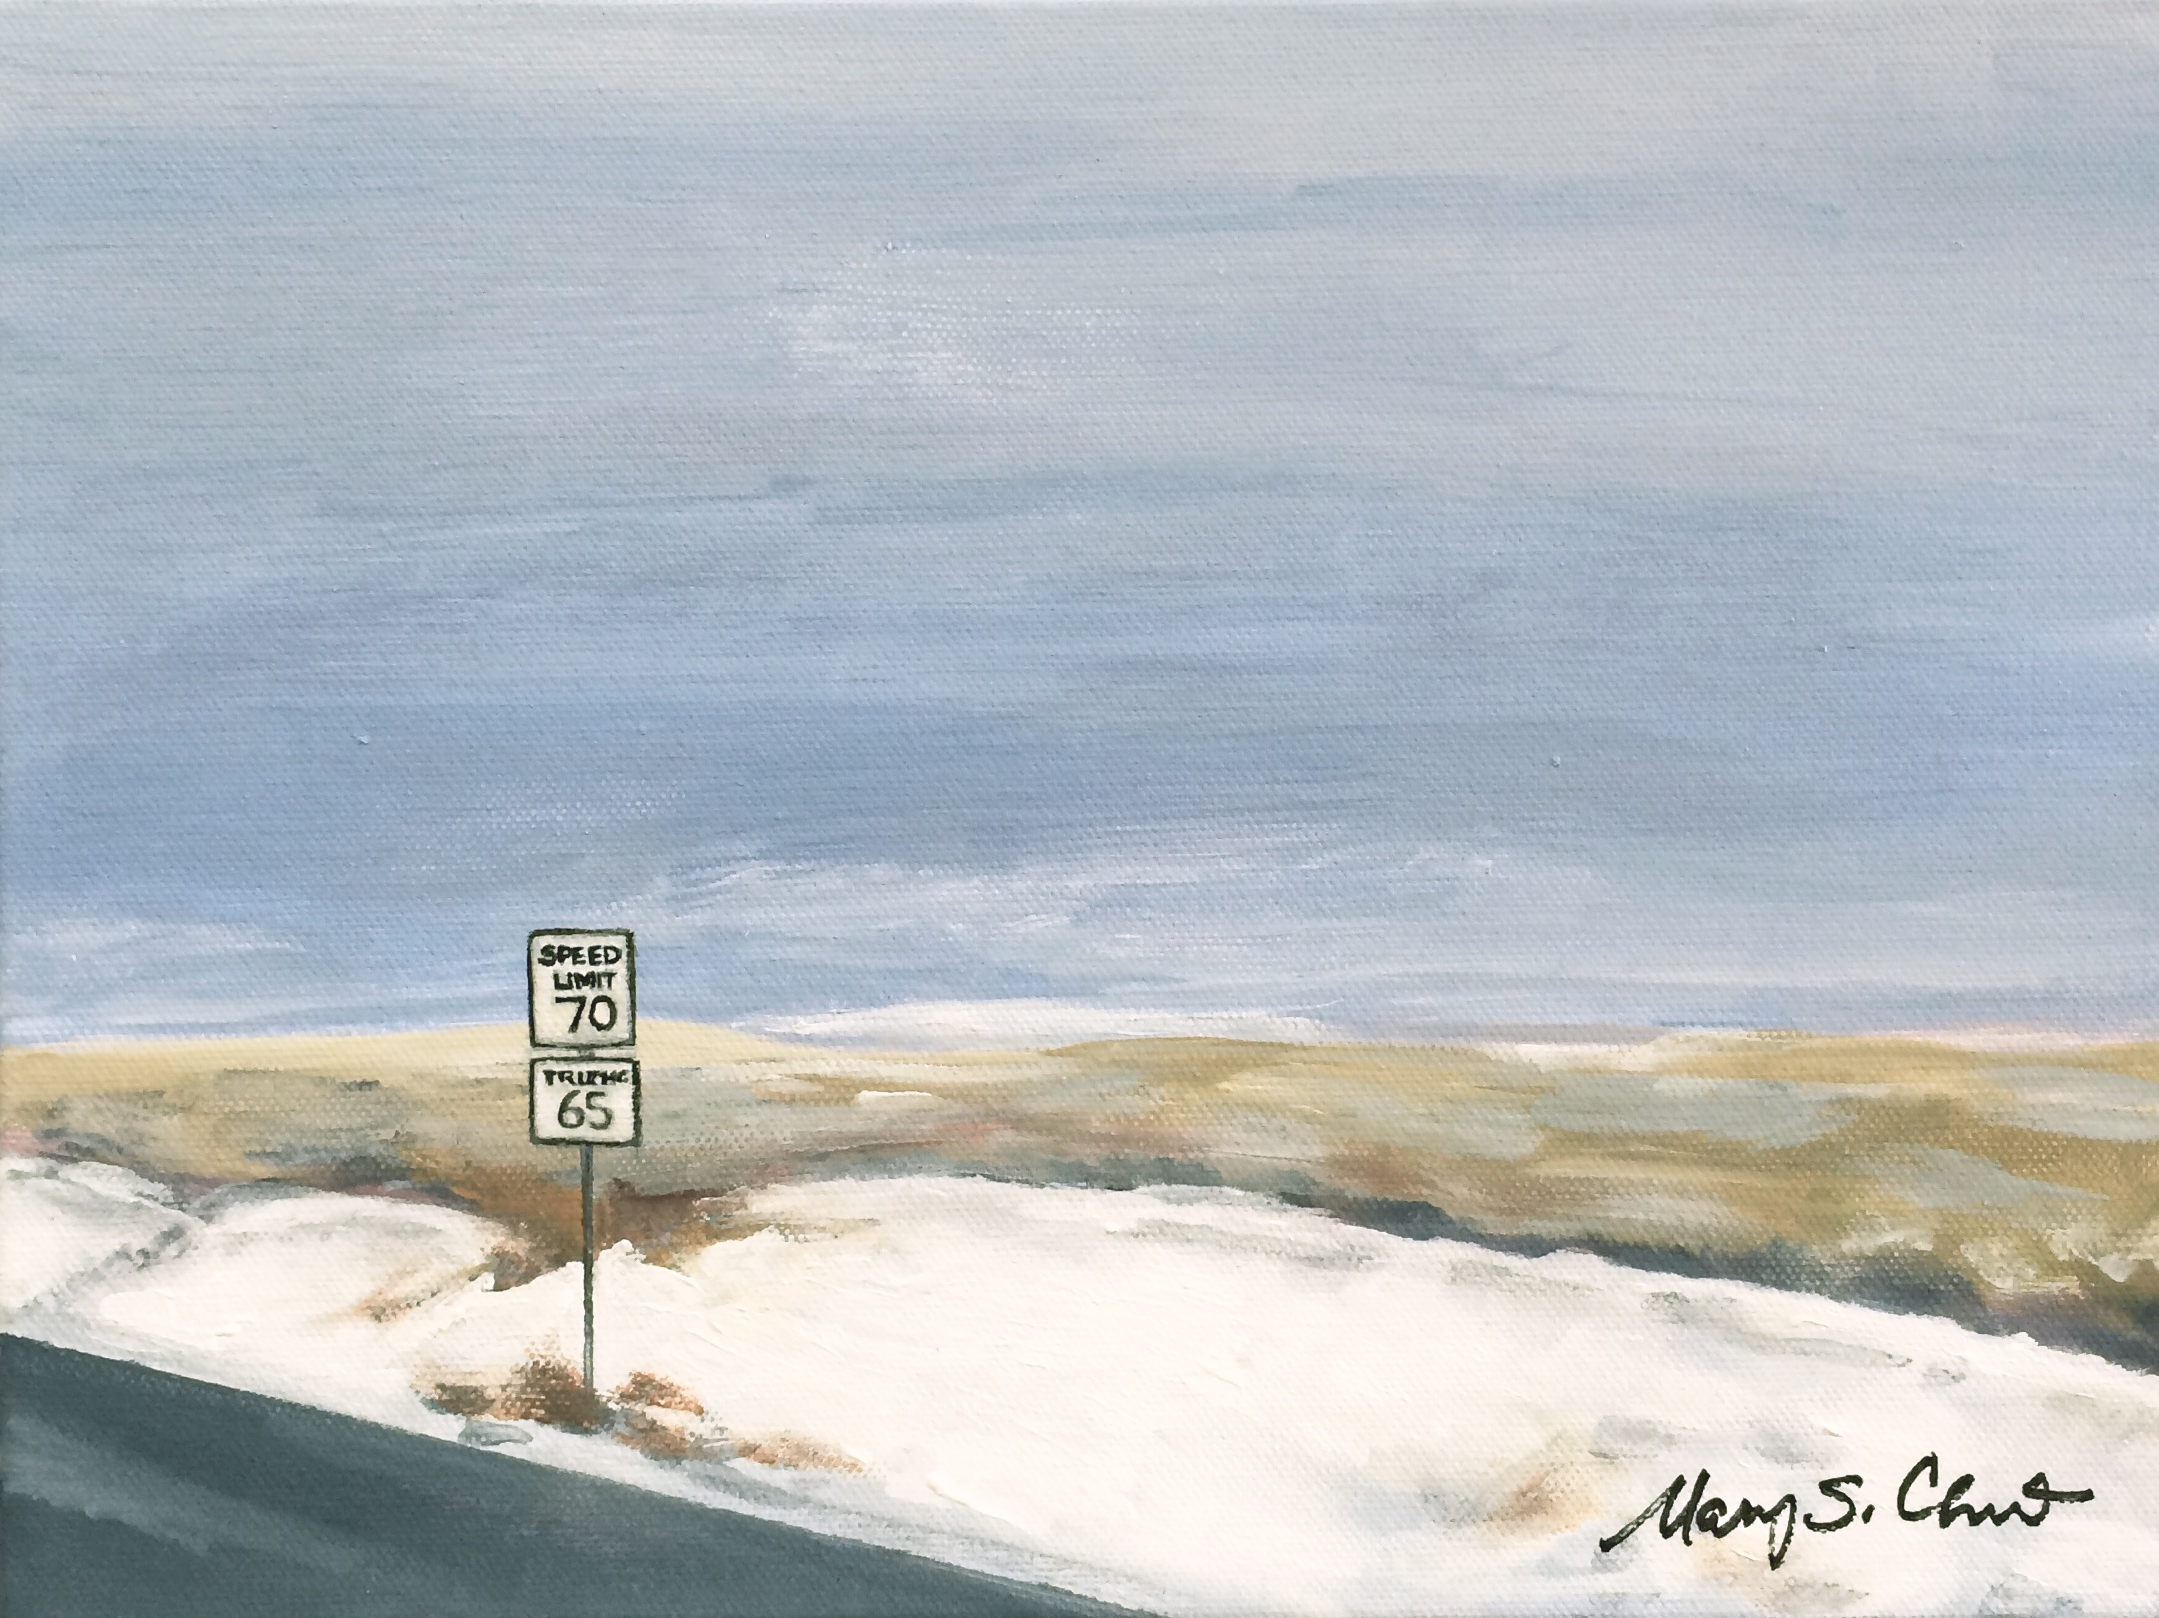 High Desert with Snow